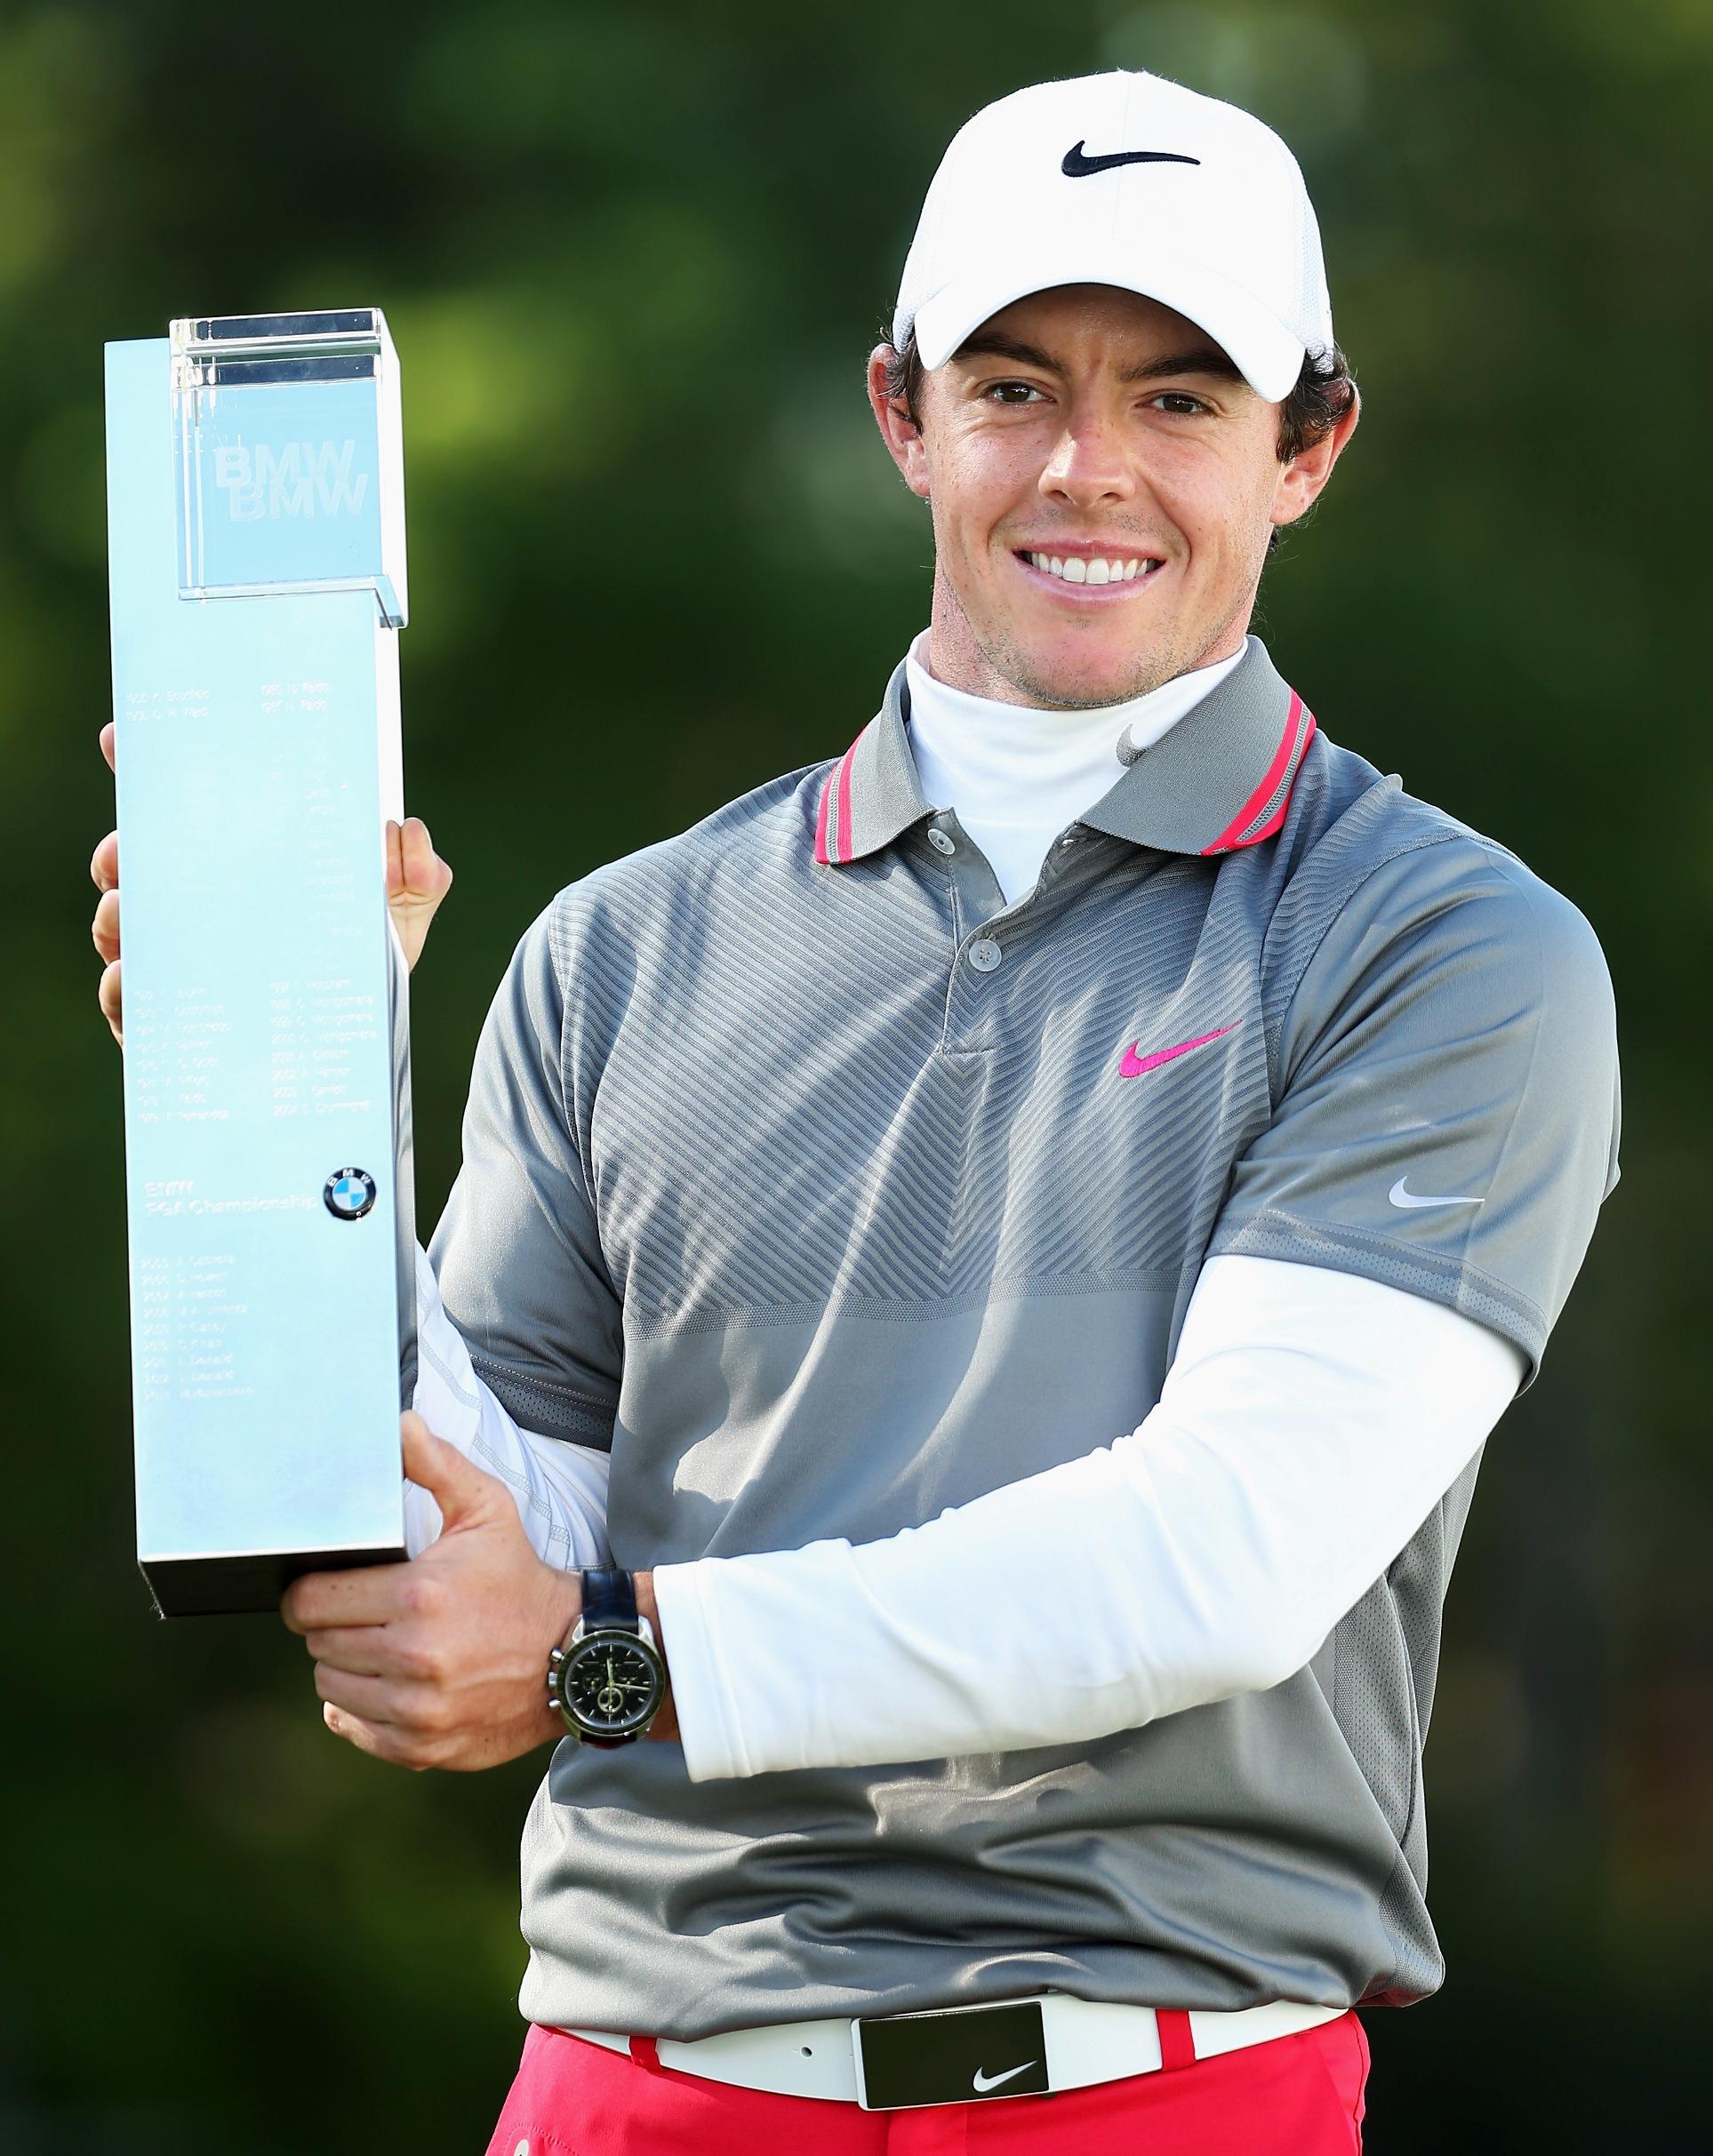 BMW PGA Championship 2014 - Rory McIlroy